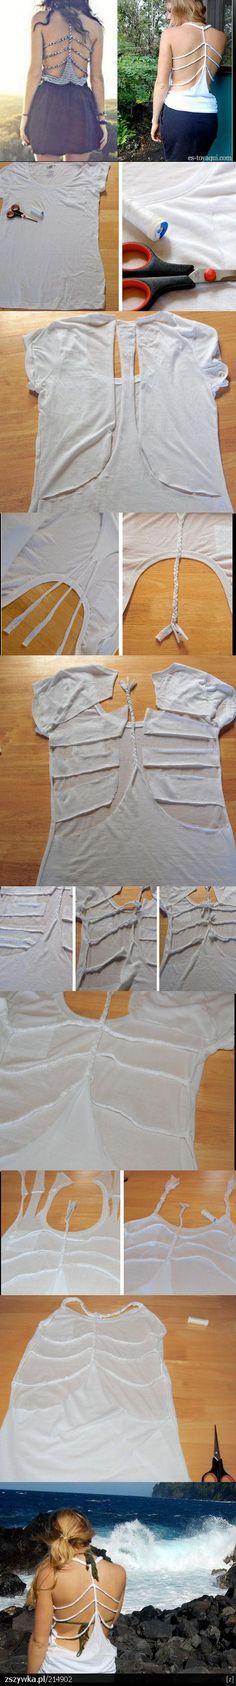 Diseña tu propia camisa